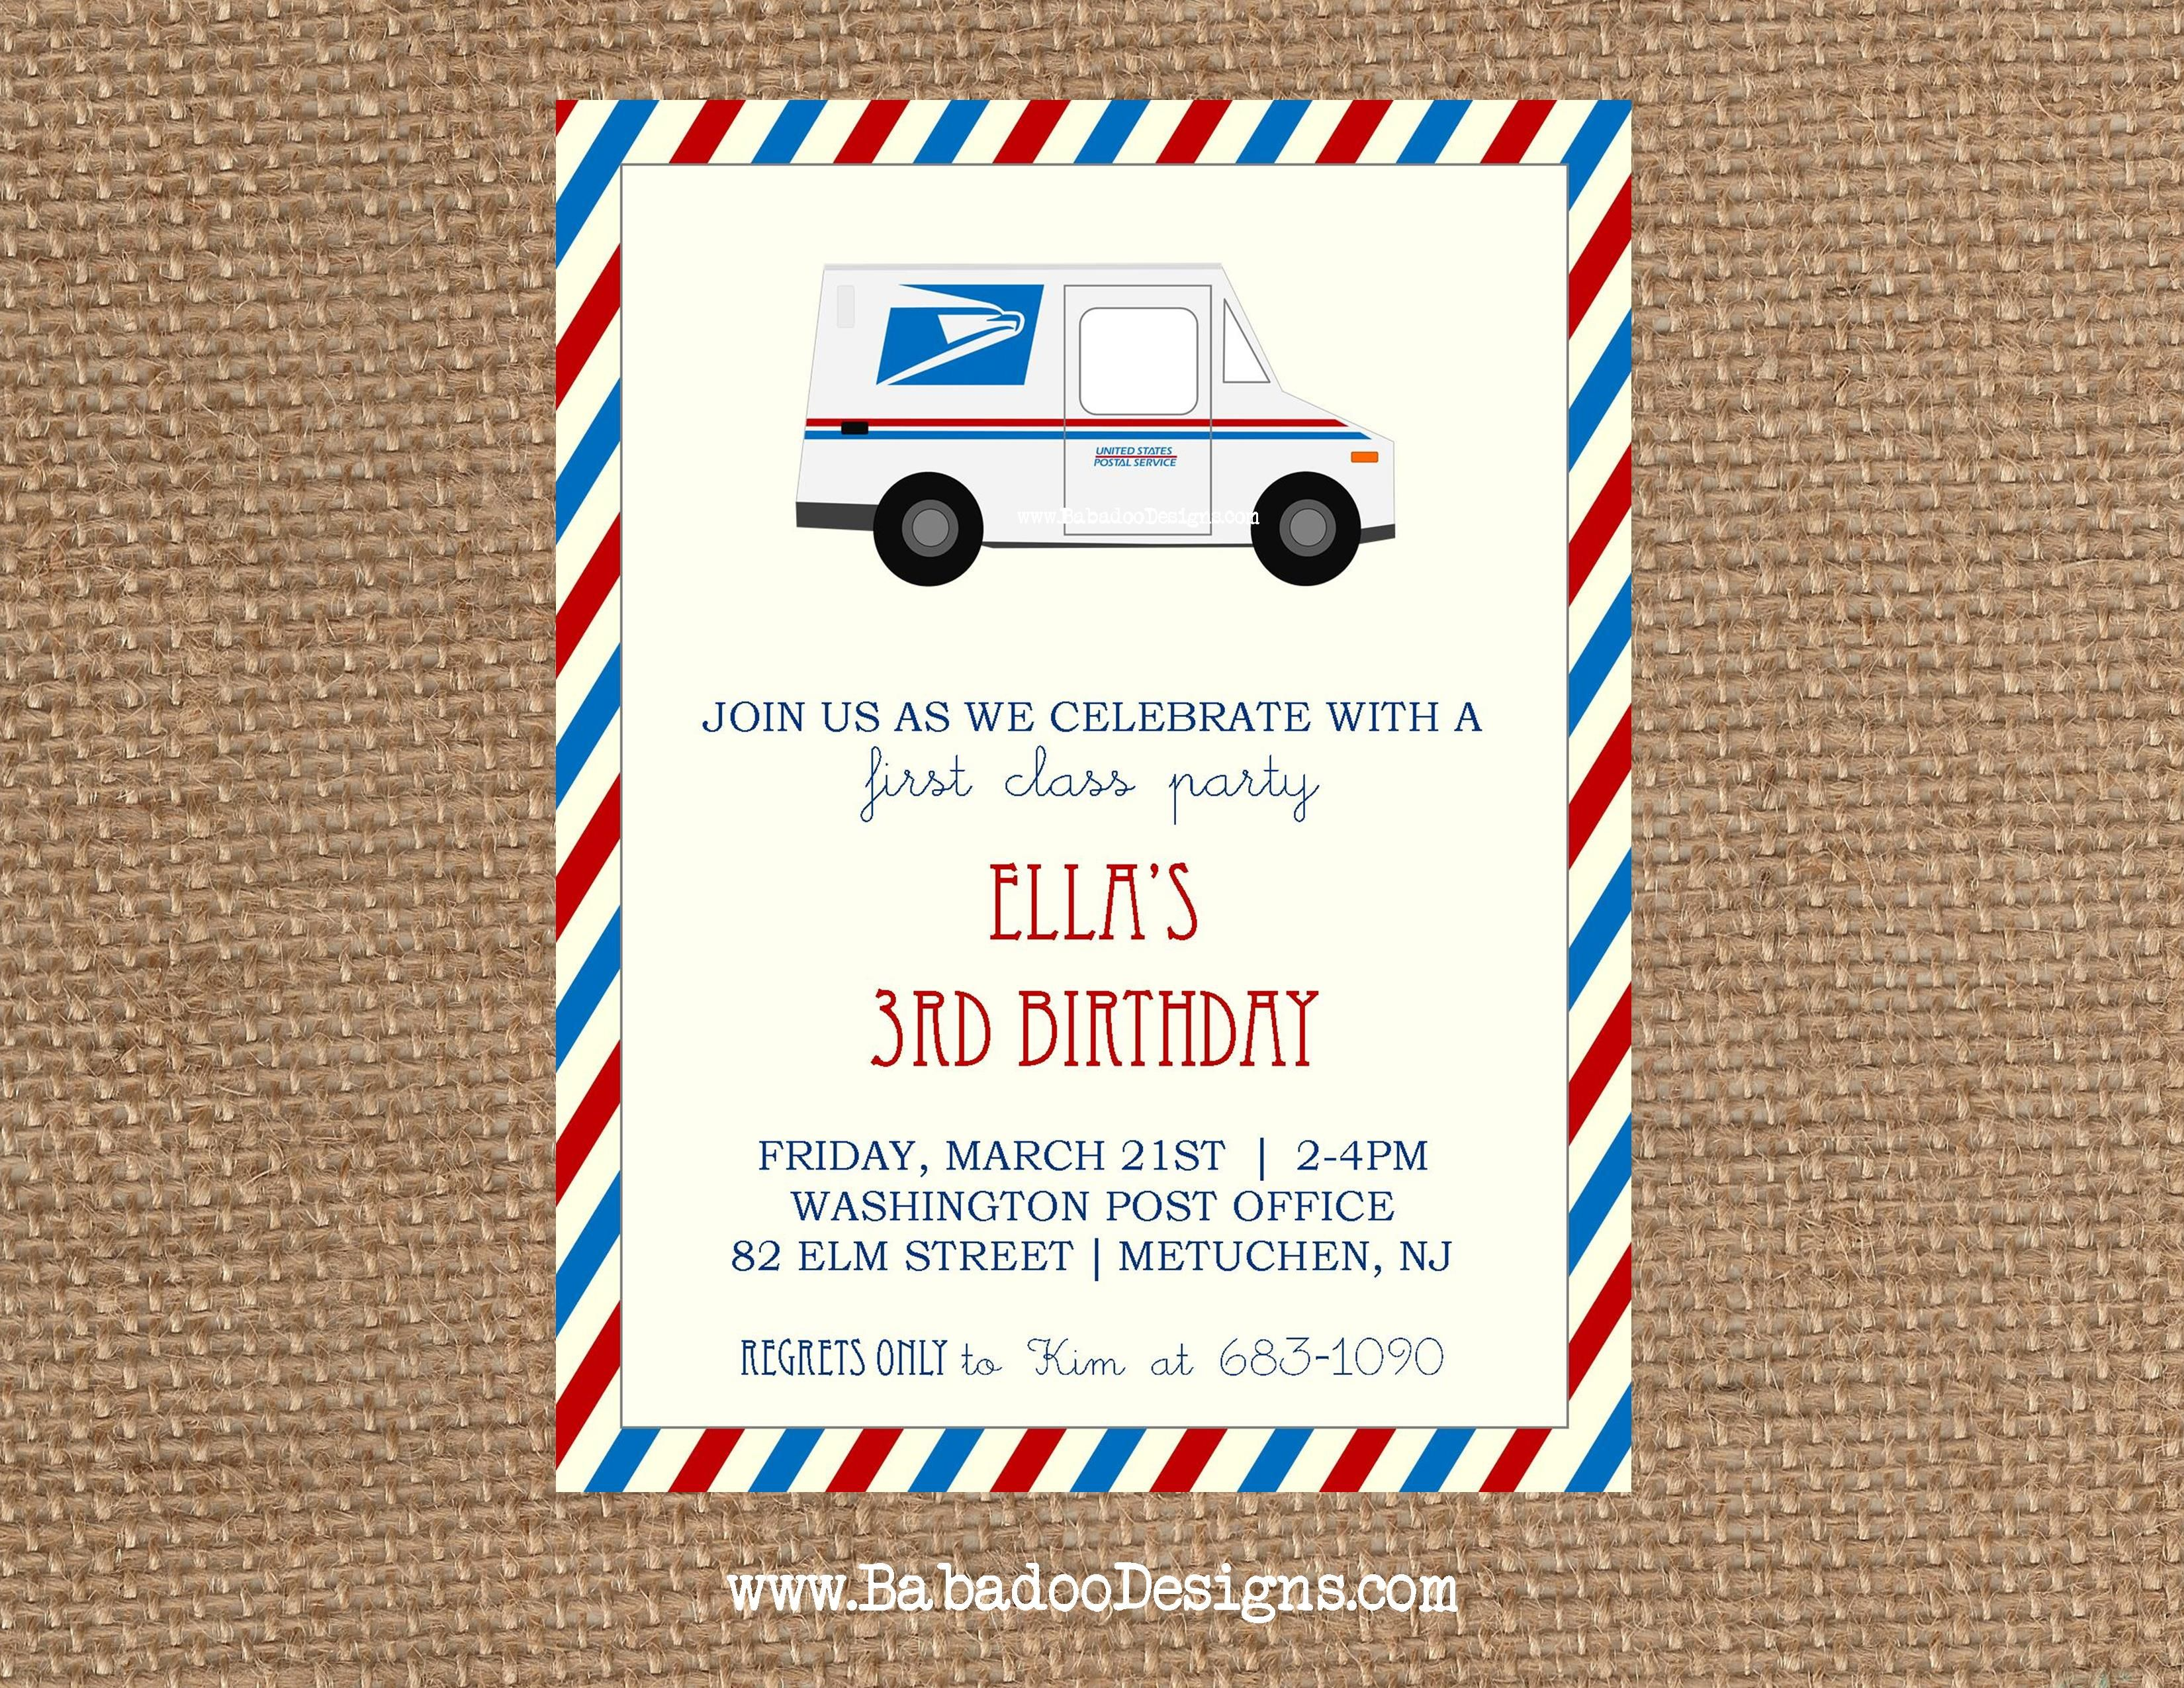 Mail truck birthday party invitation httpsetsylisting mail truck birthday party invitation httpsetsylisting stopboris Choice Image